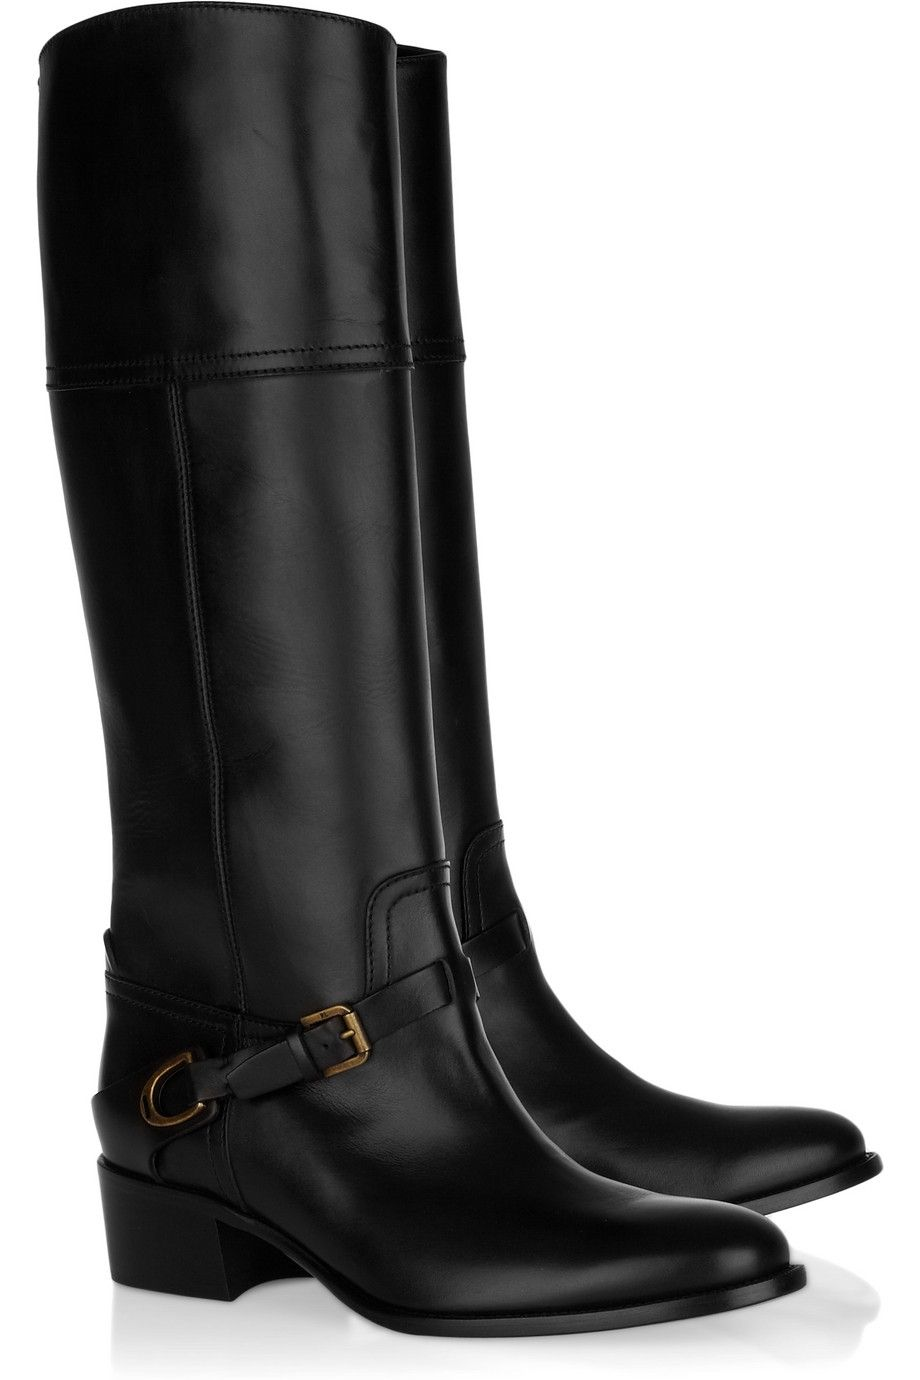 The classic equestrian-inspired boot // Ralph Lauren Safara Boots